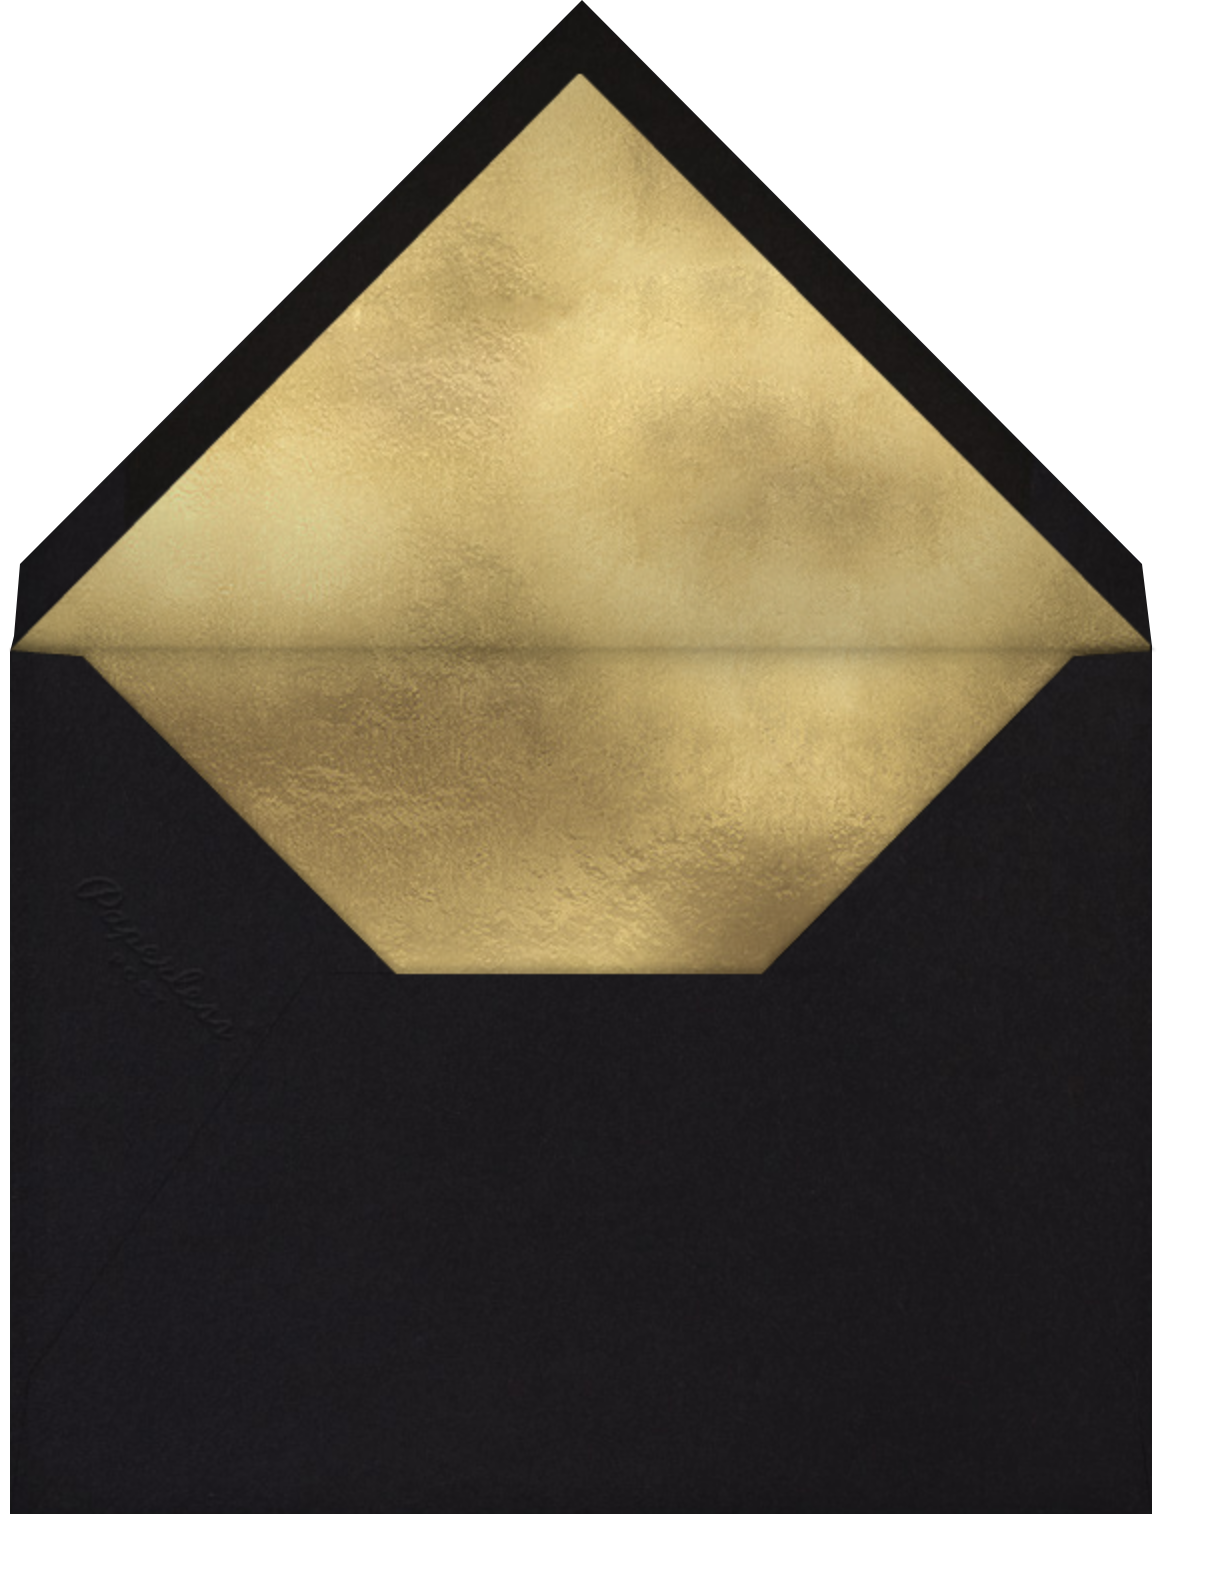 Fizzy - Black - Mr. Boddington's Studio - Professional events - envelope back